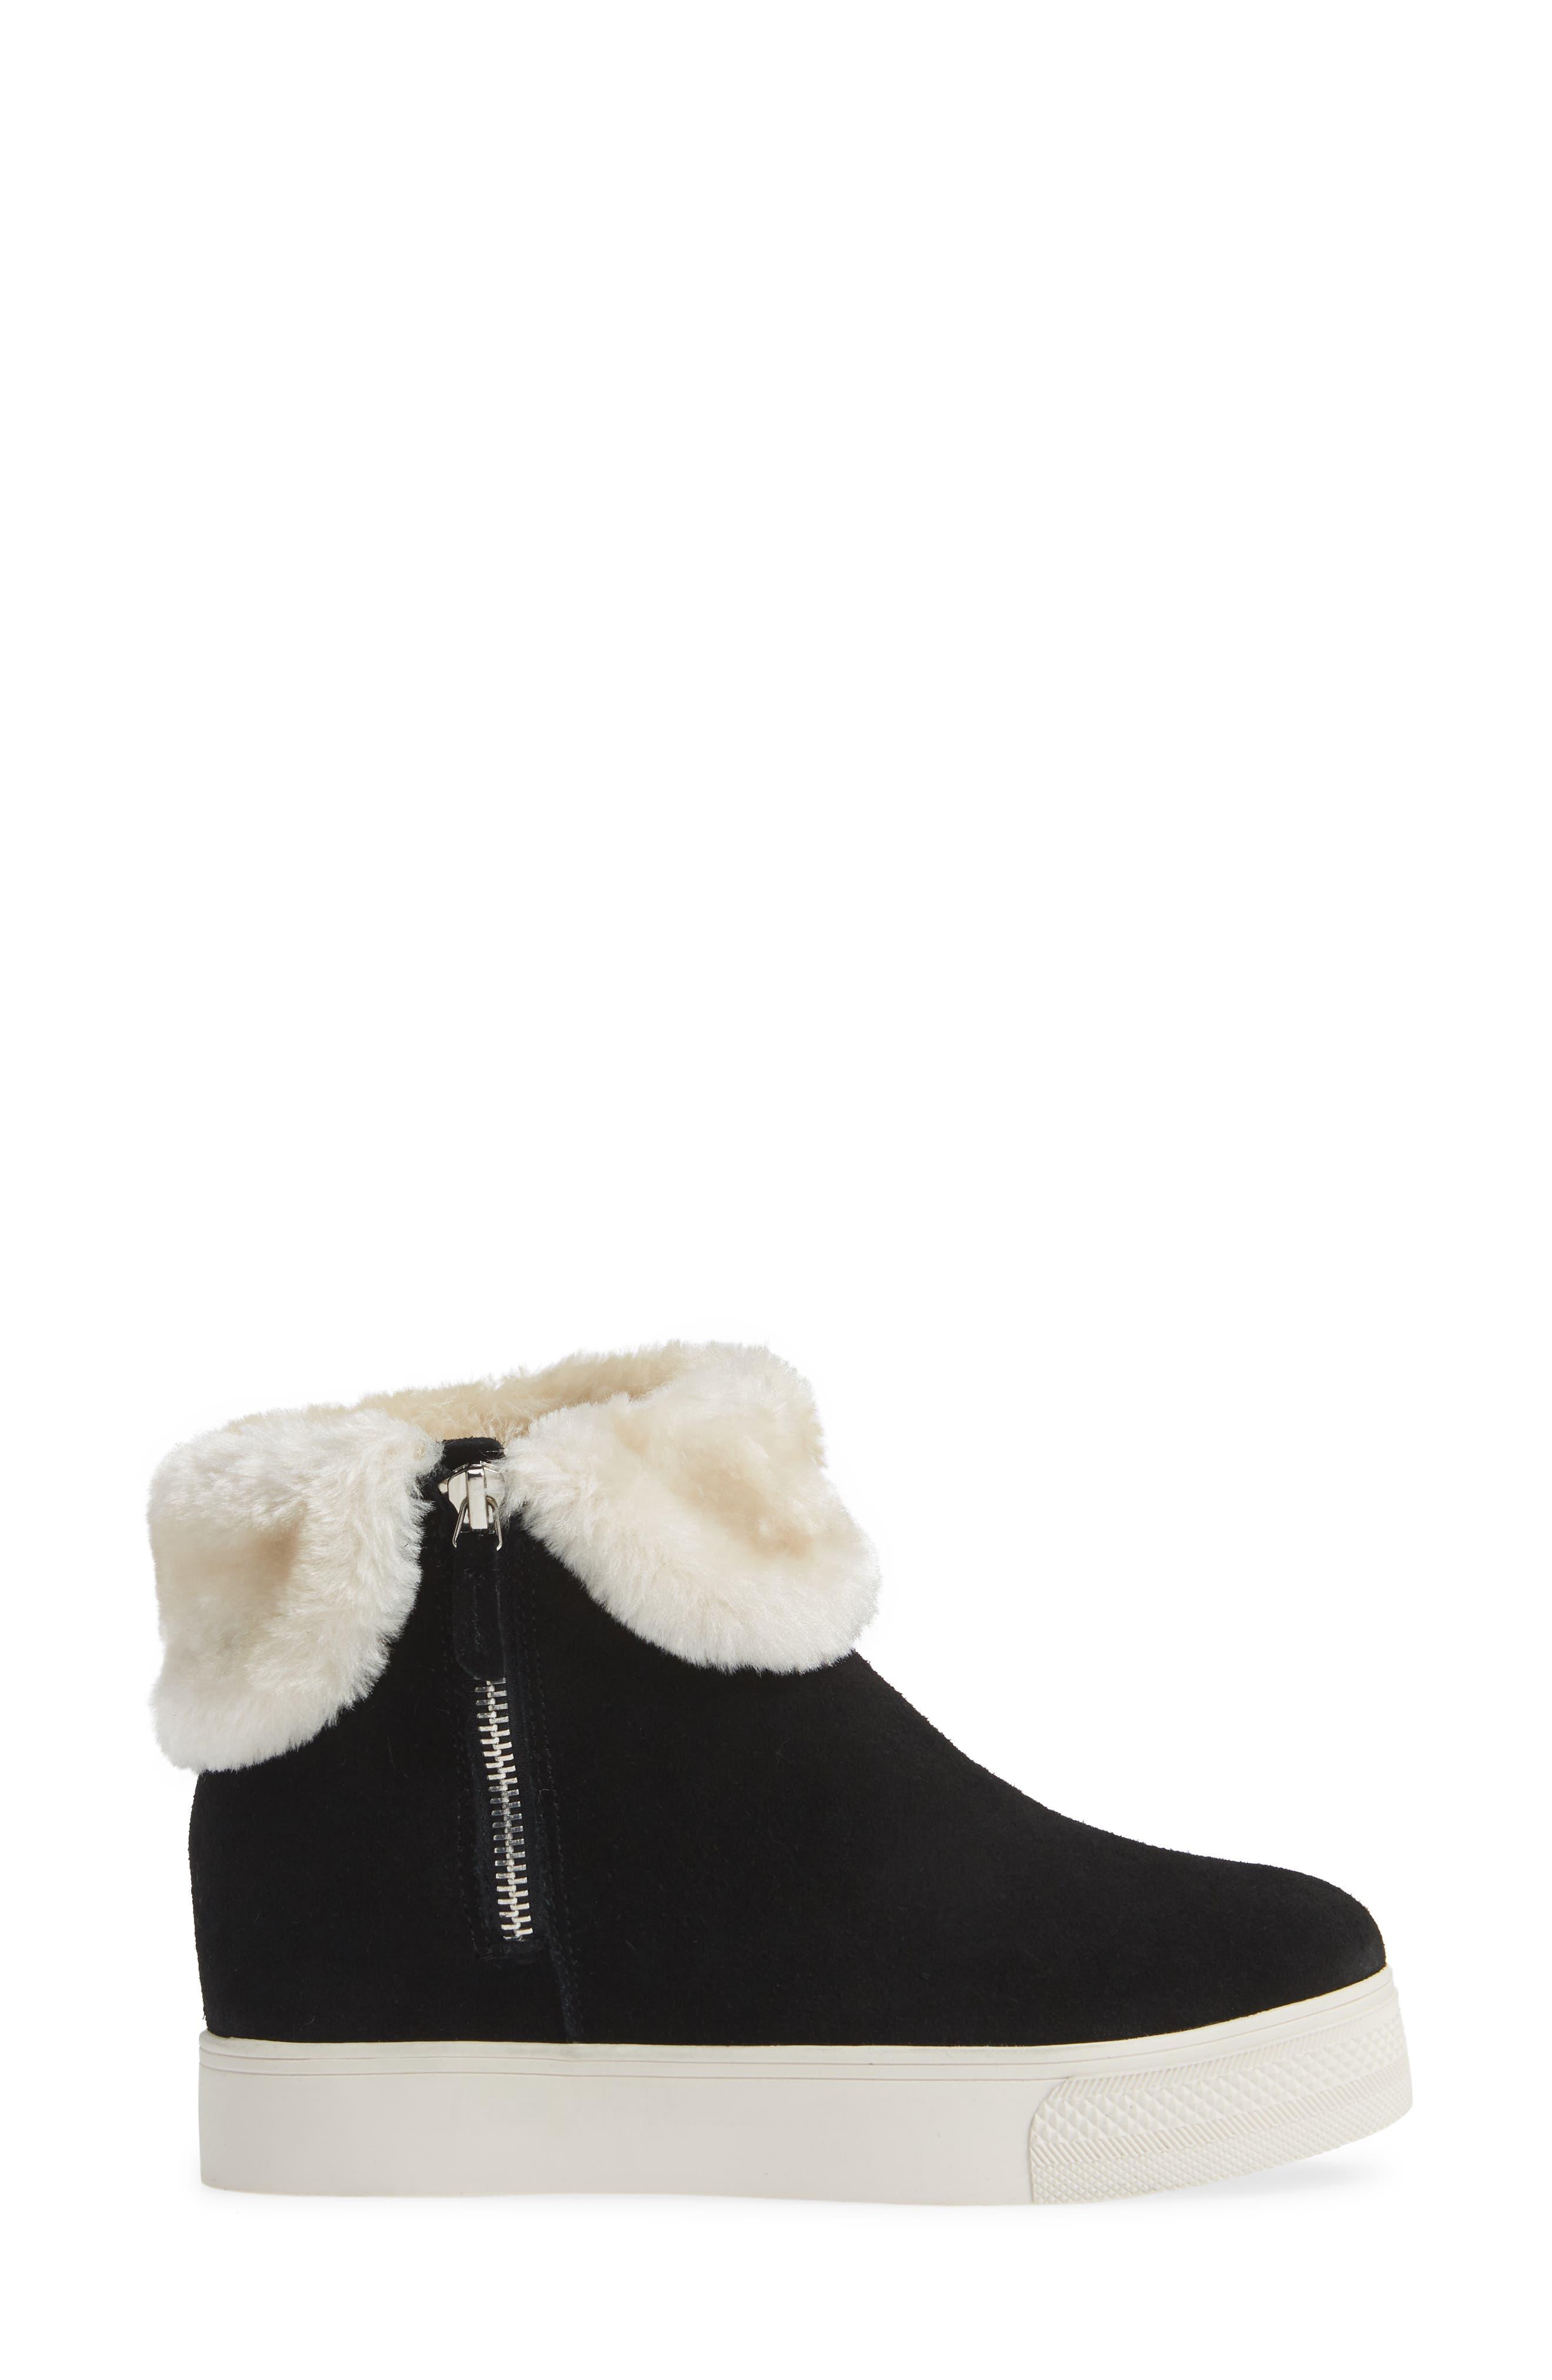 STEVE MADDEN,                             Faux Fur Lined Sneaker,                             Alternate thumbnail 3, color,                             006